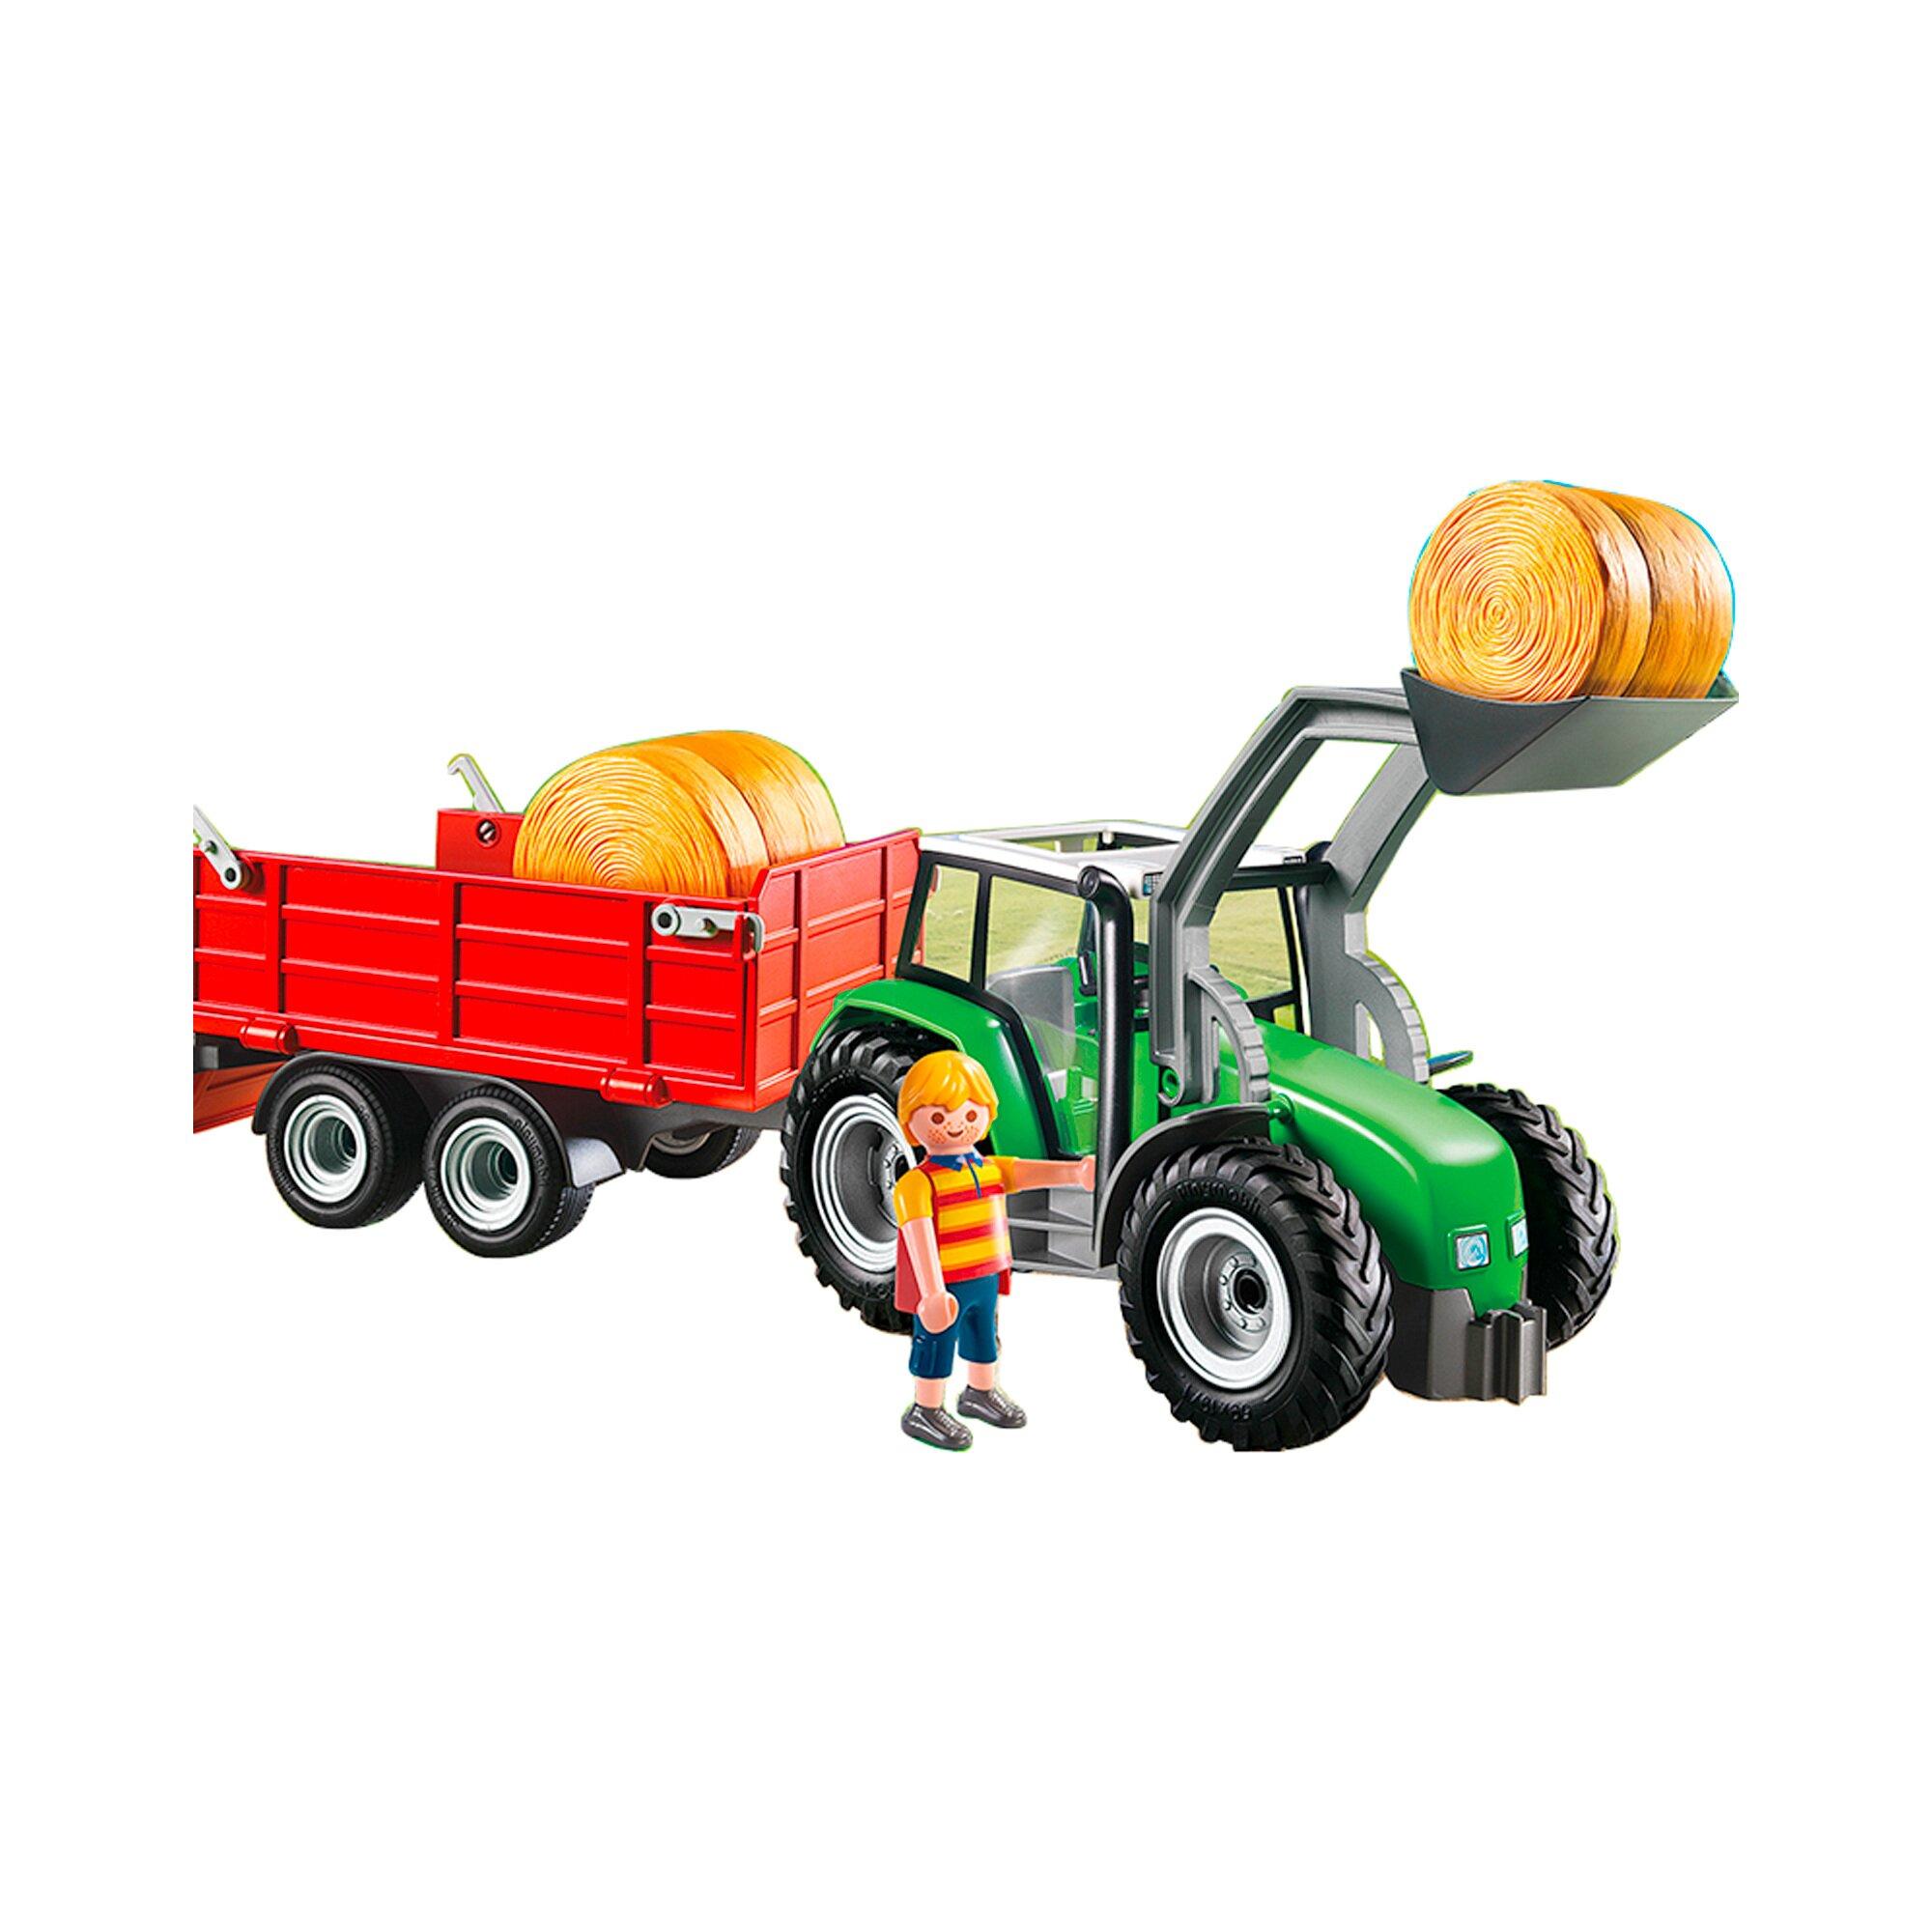 country-6130-gro-er-traktor-mit-anhanger